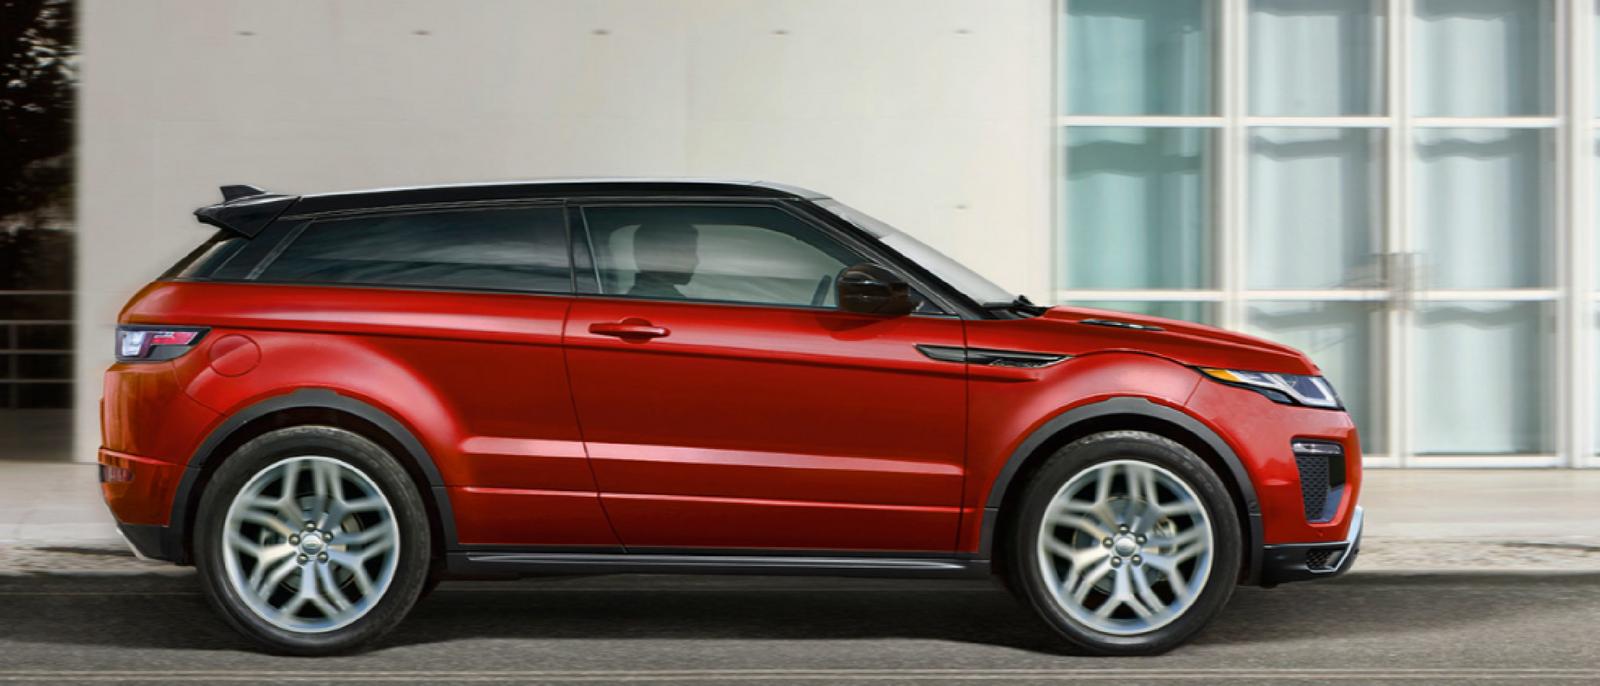 2016-Range-Rover-Evoque-Exterior